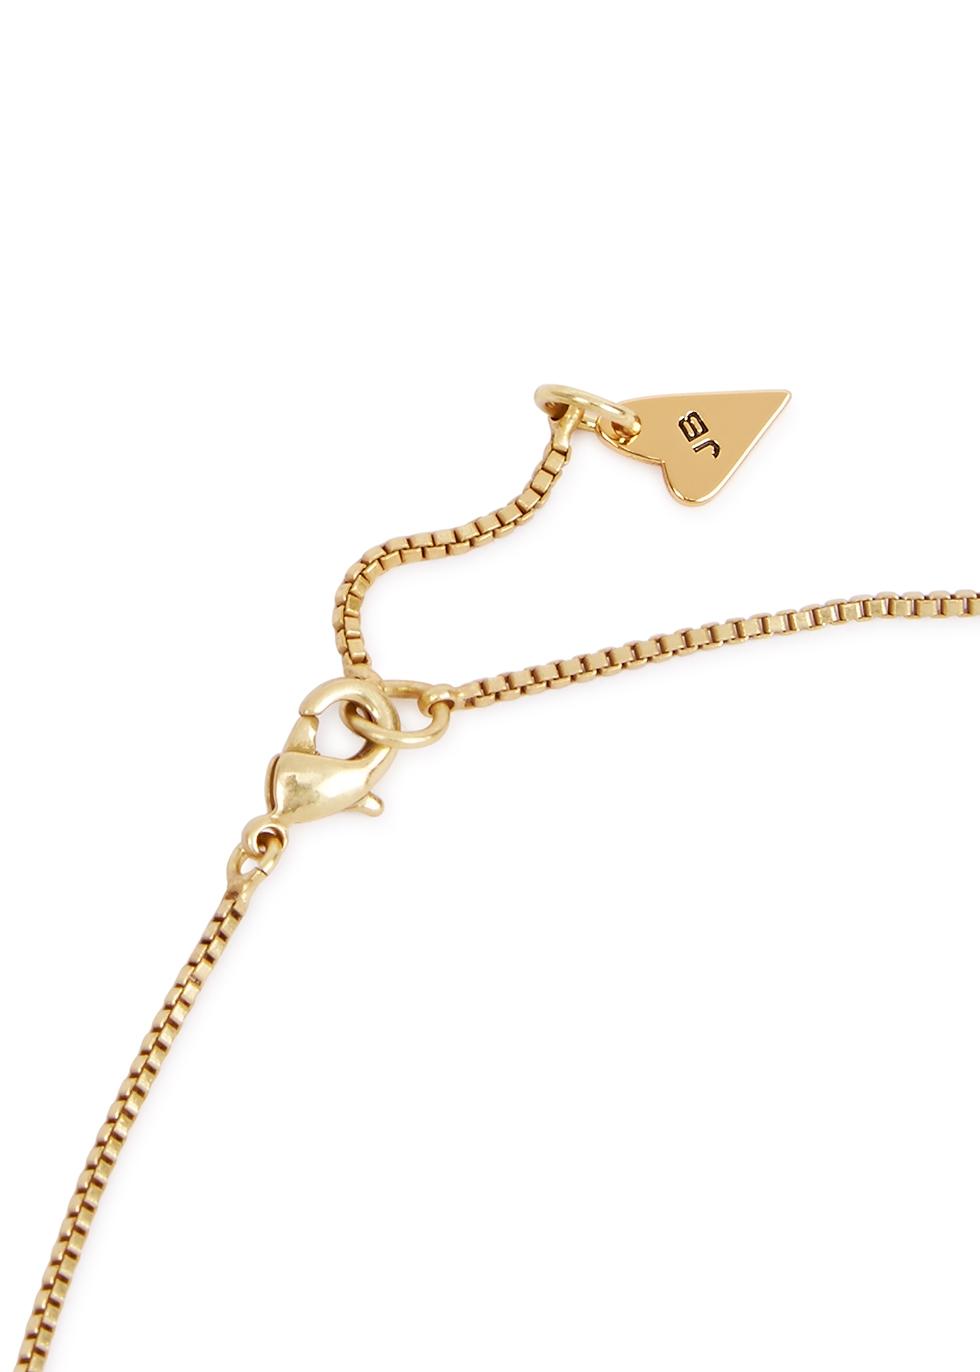 Love 14kt gold-dipped necklace - JENNY BIRD